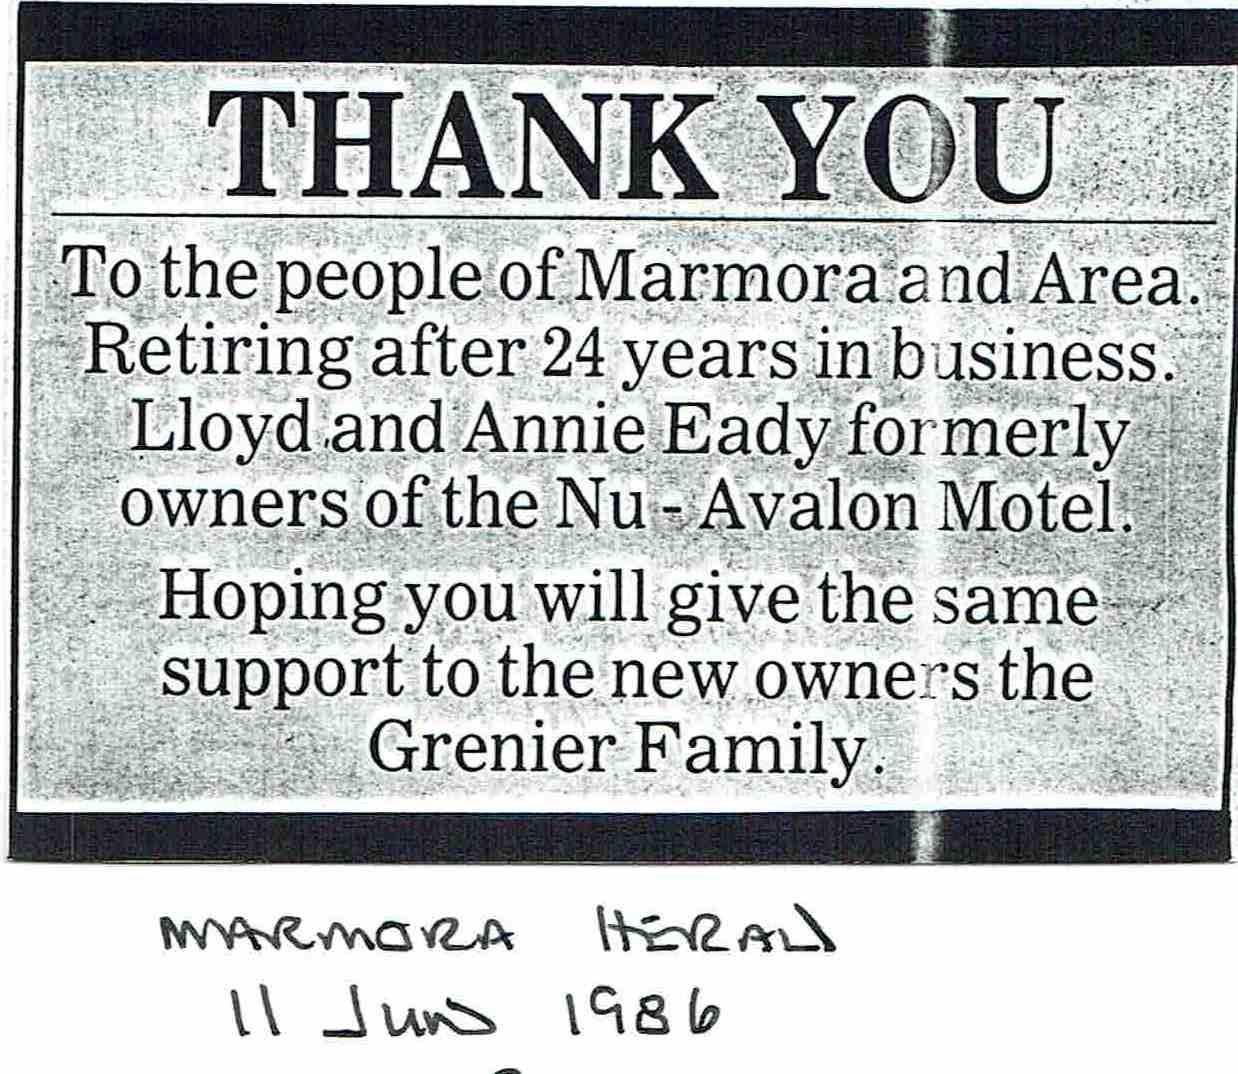 1988 Nu Avalon Motel,  Eady,  Grenier.JPG